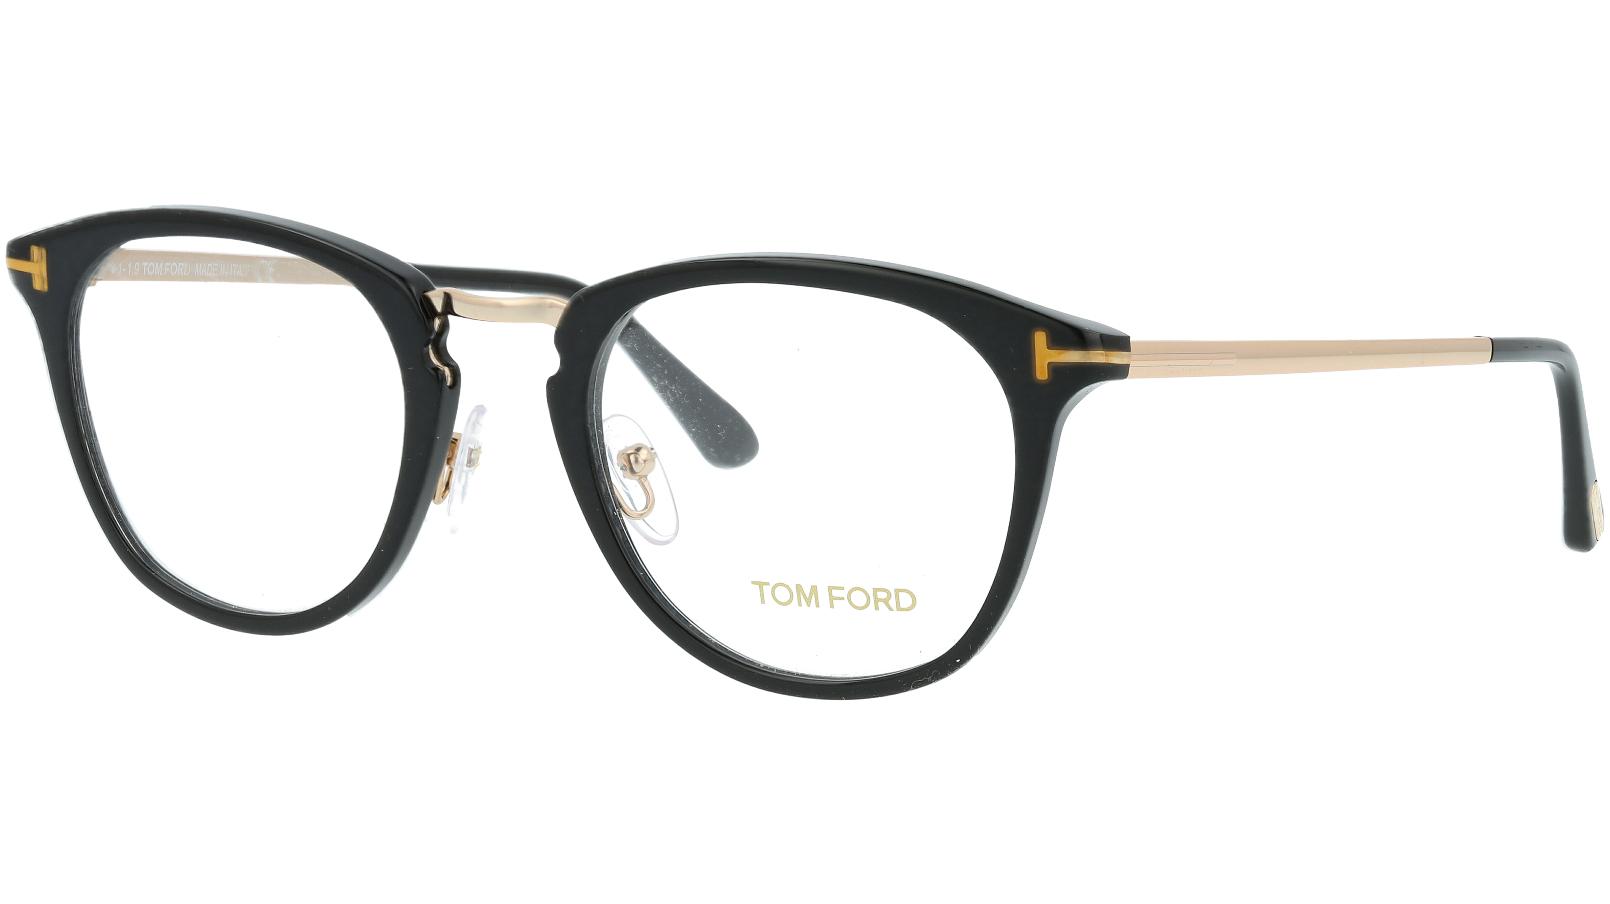 Tom Ford TF5466 001 51 Black Glasses